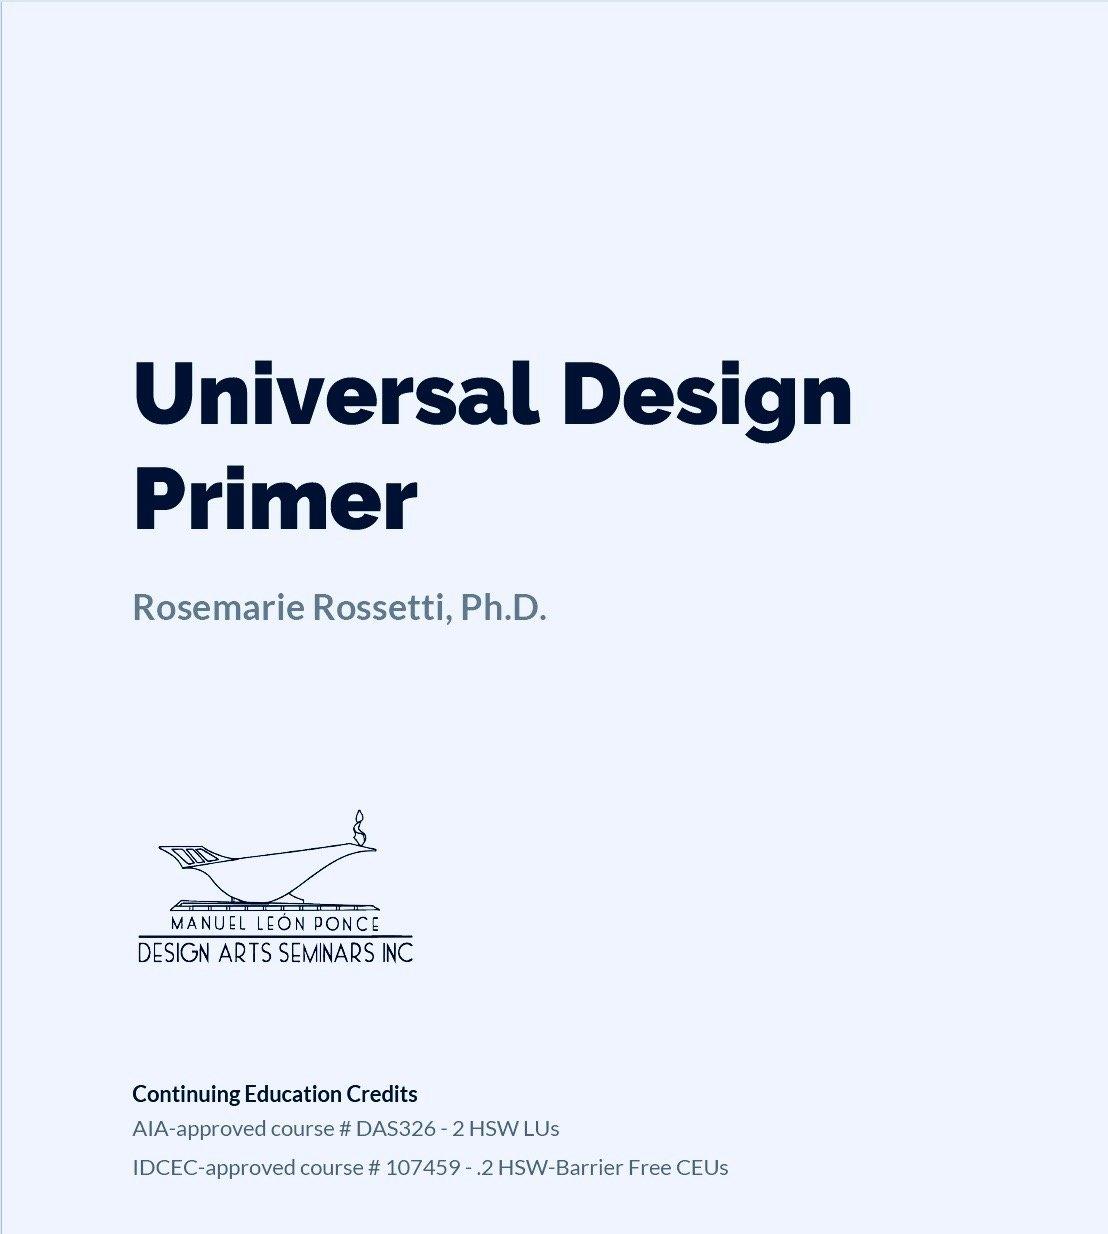 Universal Design Primer